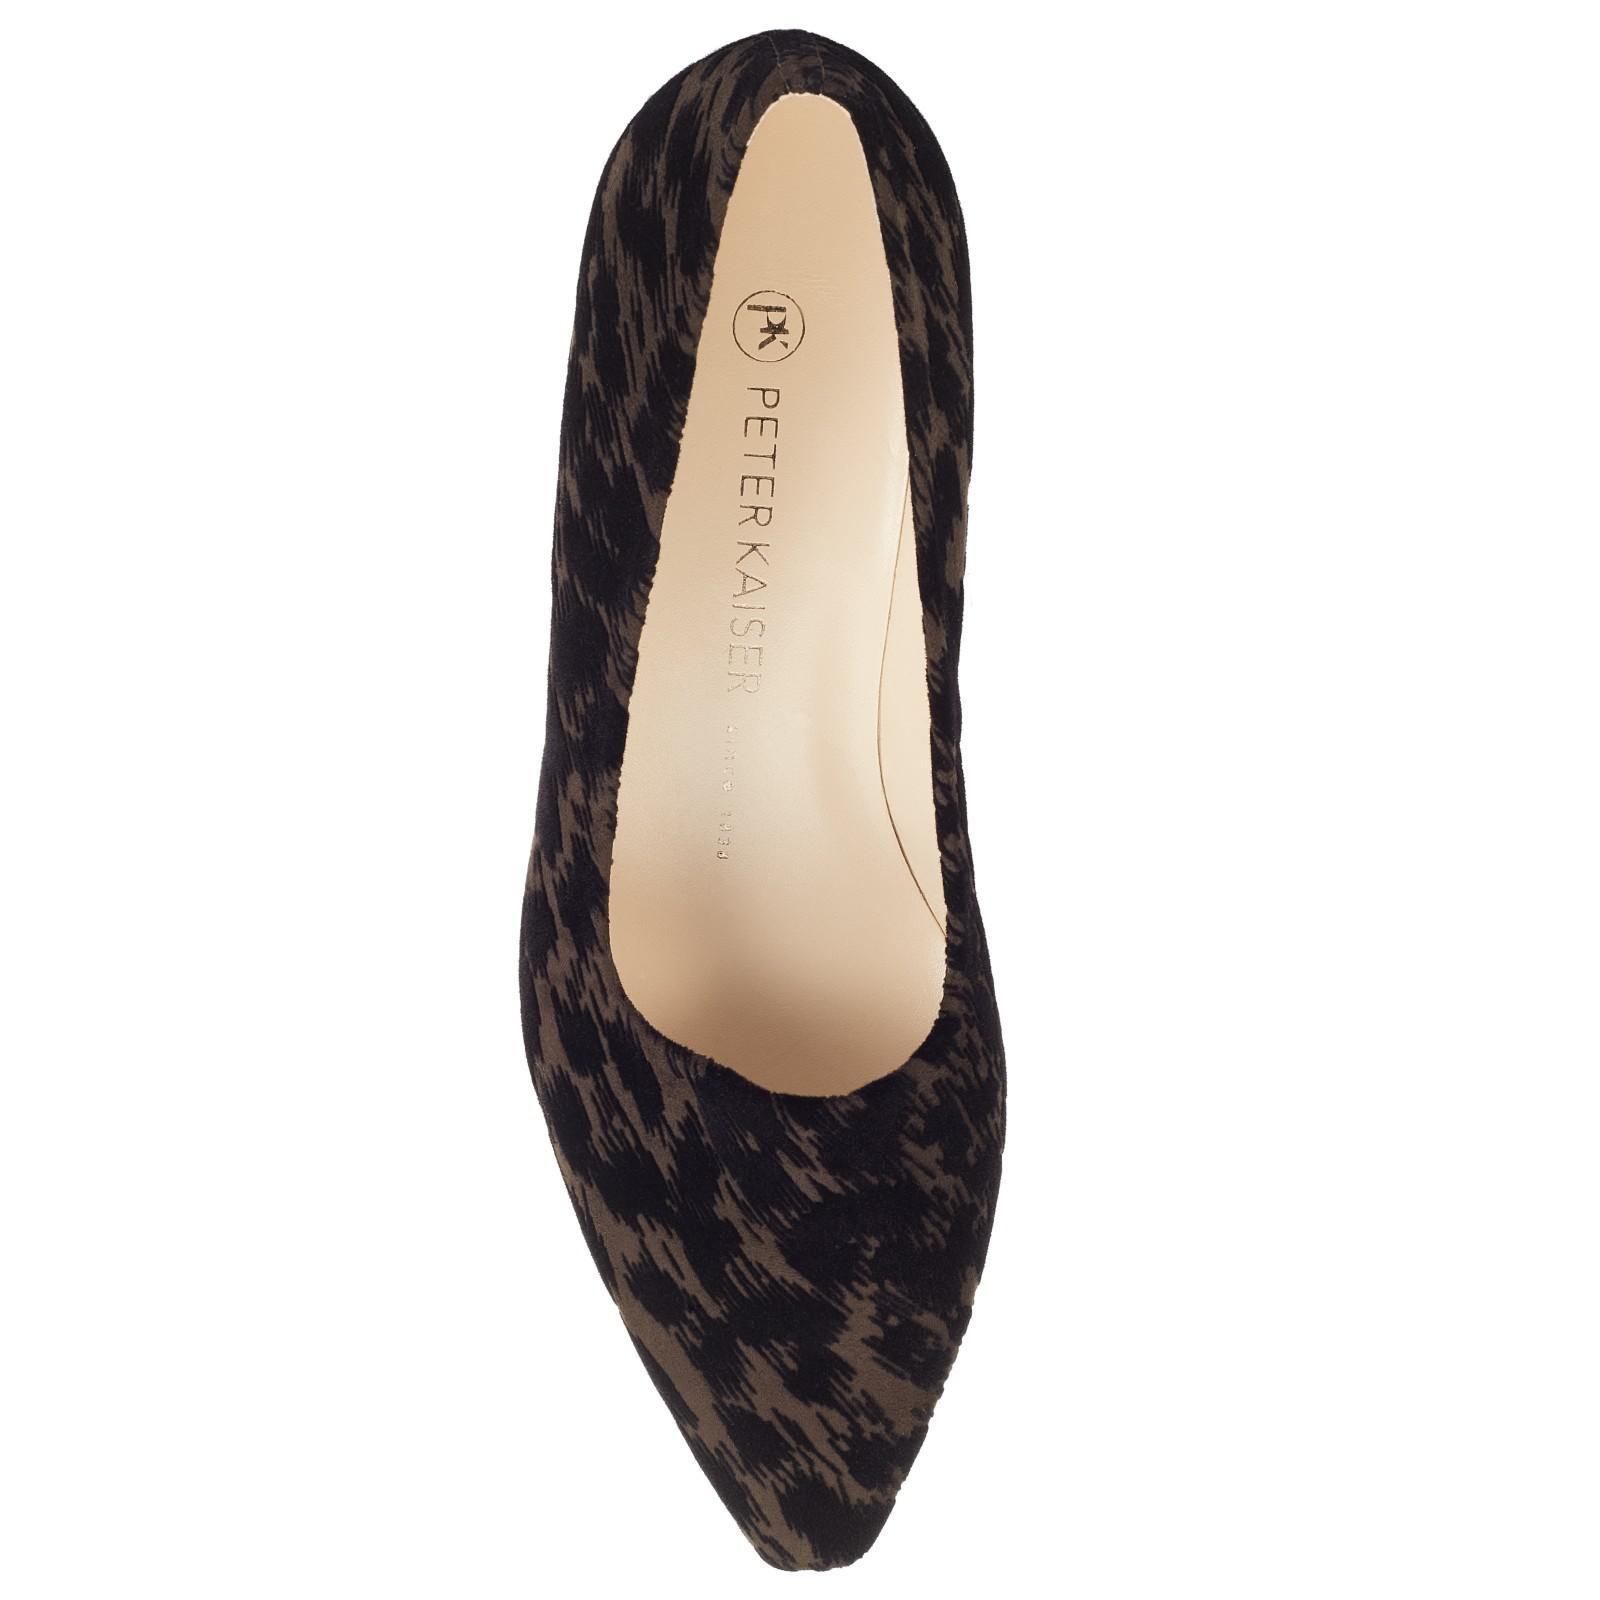 Peter Kaiser Lisana Closed Block Heeled Court Shoes Eastbay Cheap Online aaow1lZpyH